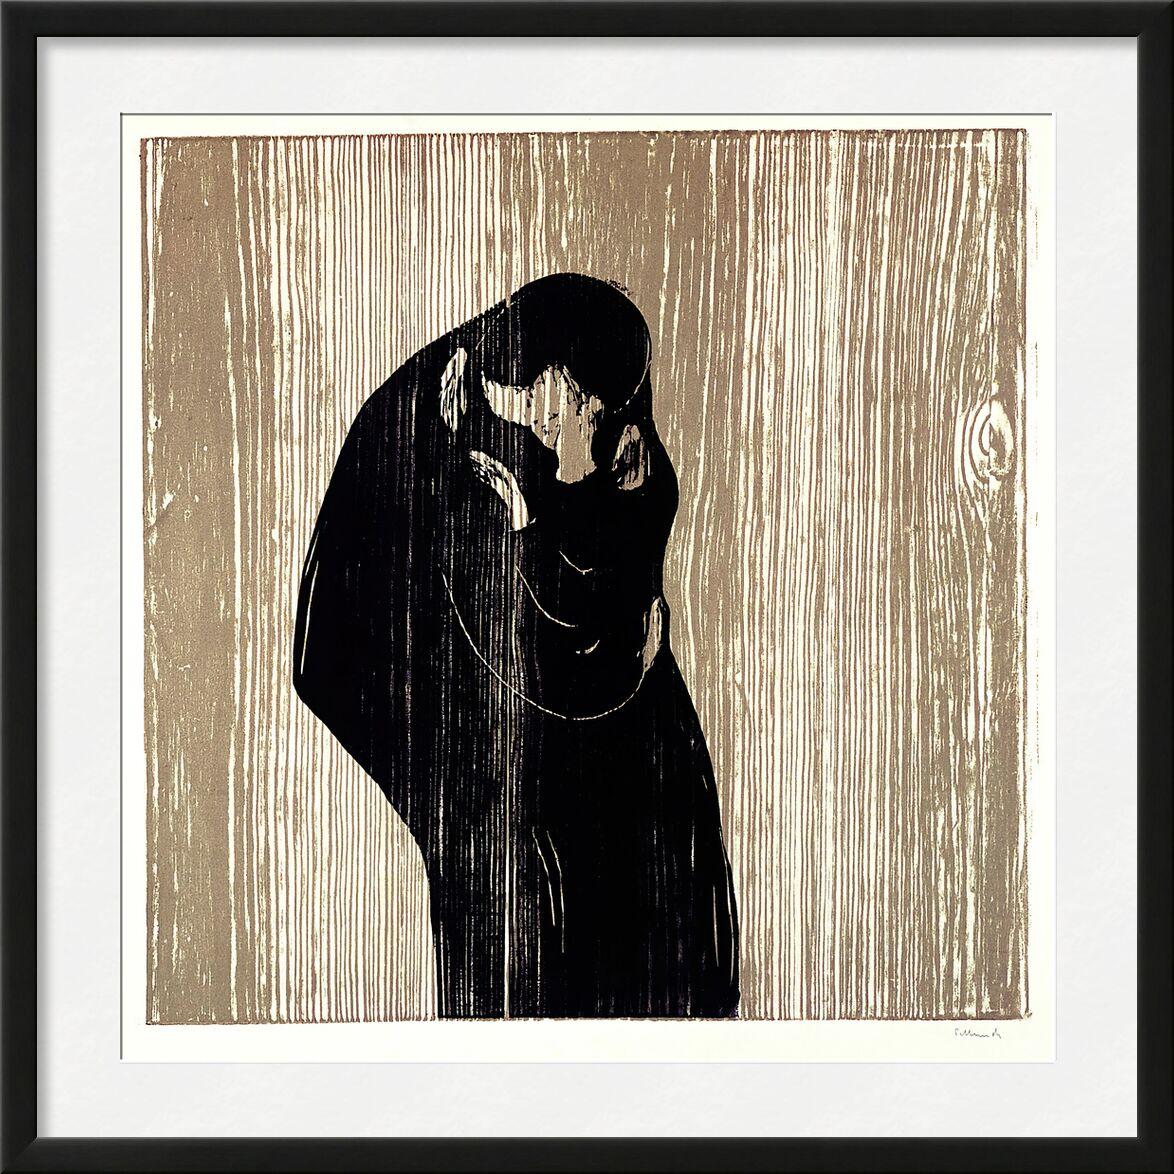 Der Kuss IV - Edvard Munch from AUX BEAUX-ARTS, Prodi Art, woman, man, kiss, drawing, Edvard Munch